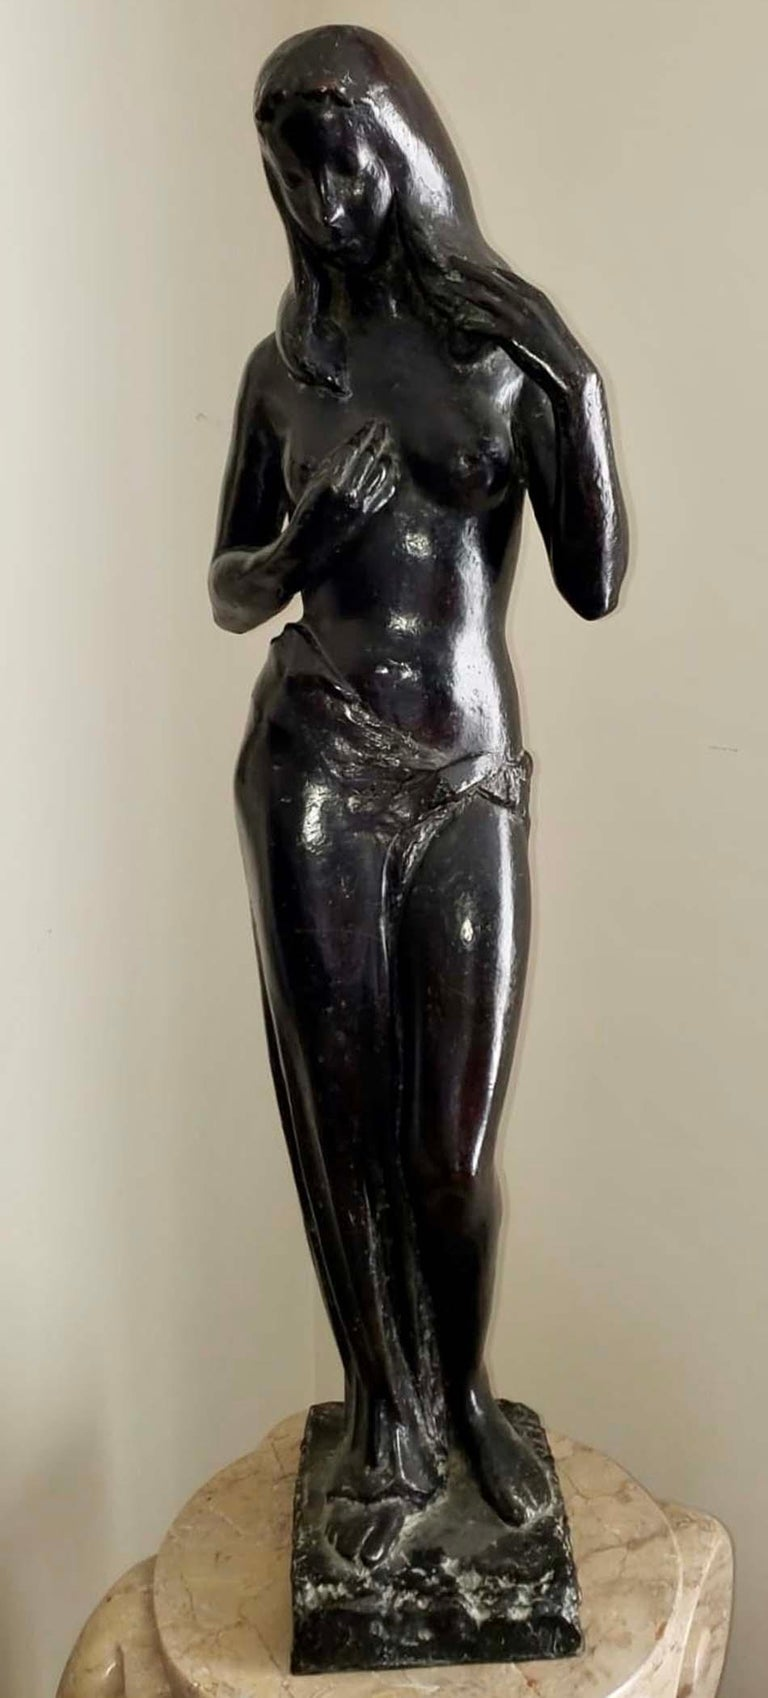 Guy Charles Revol Figurative Sculpture - Venus